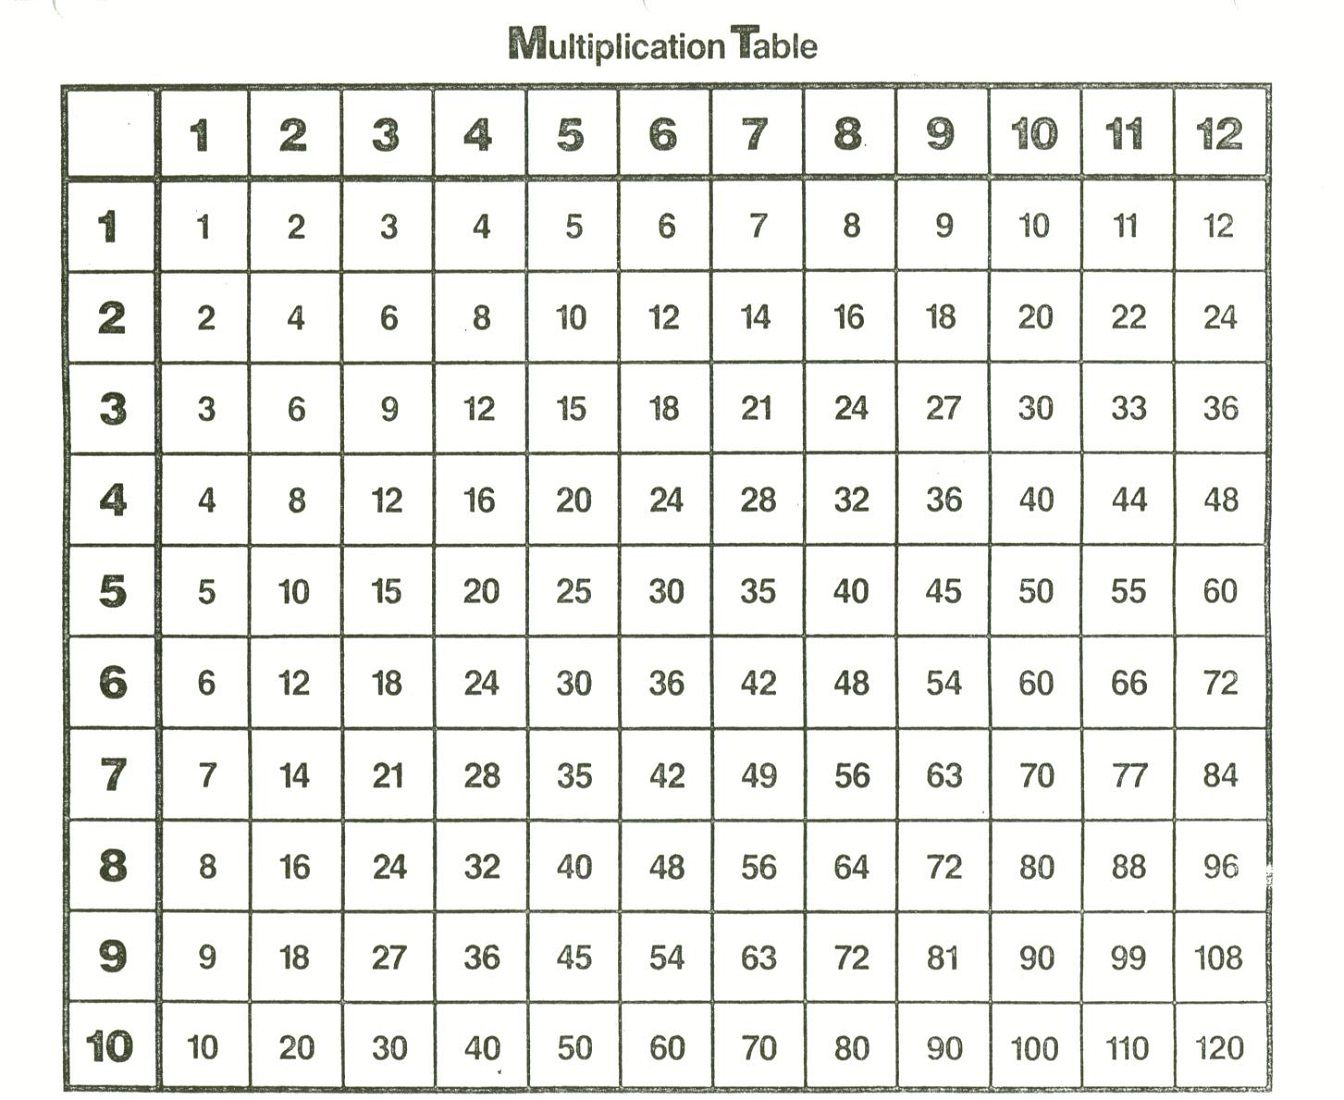 Times Tables Chart 1 12 To Print - Vatan.vtngcf pertaining to Printable Multiplication Grid Blank